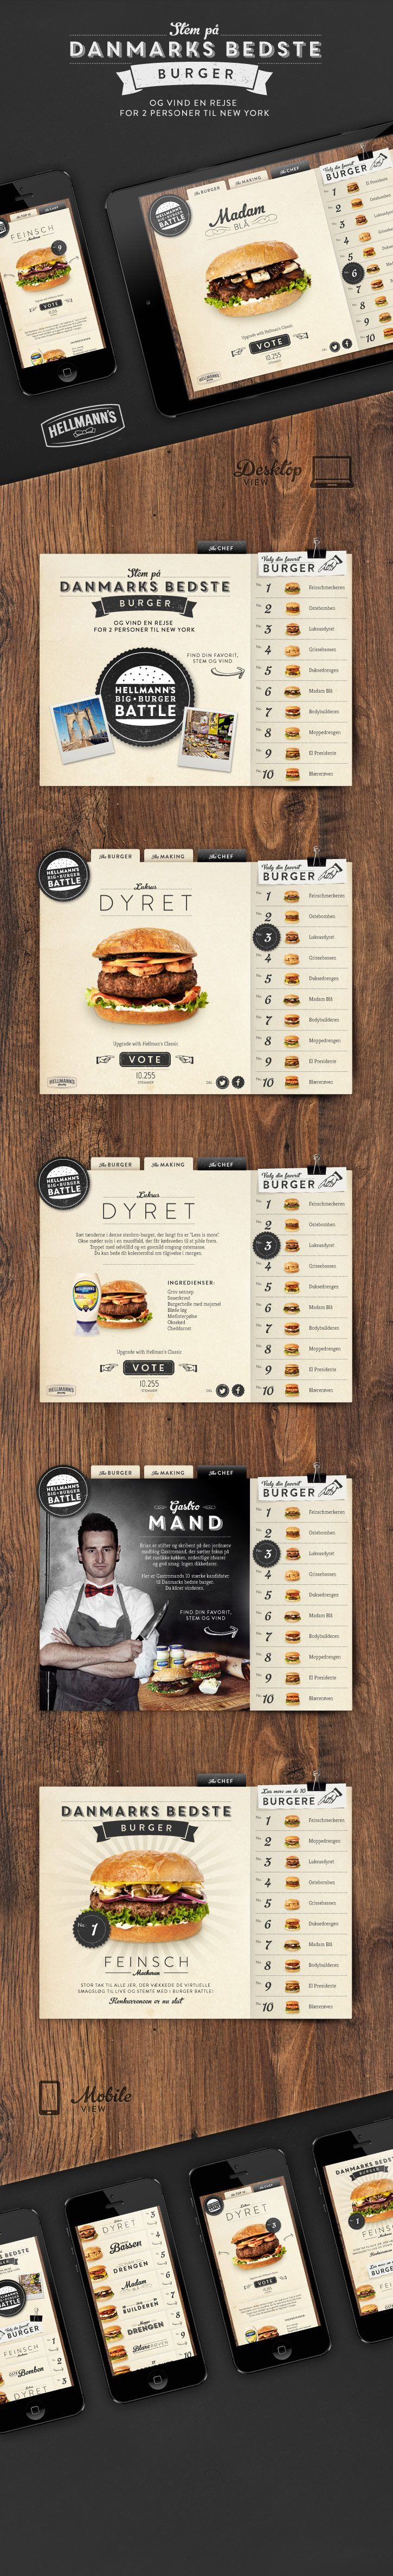 Great design inspo for a restaurant brand identity